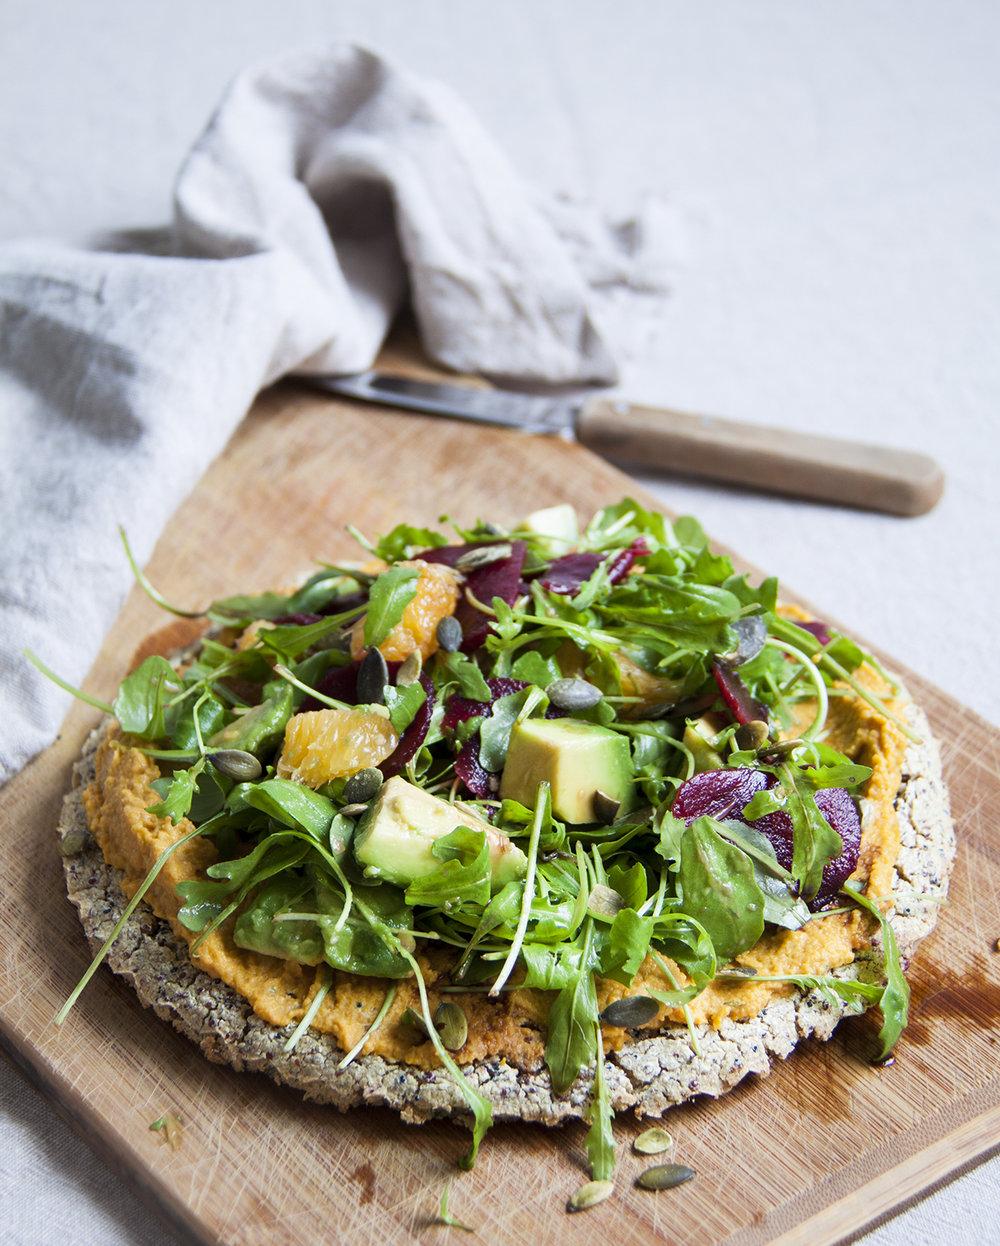 quinoapizza-wortelhummus-sinaasappel-avocado-vegan-whole-foods-olievrij-02.jpg